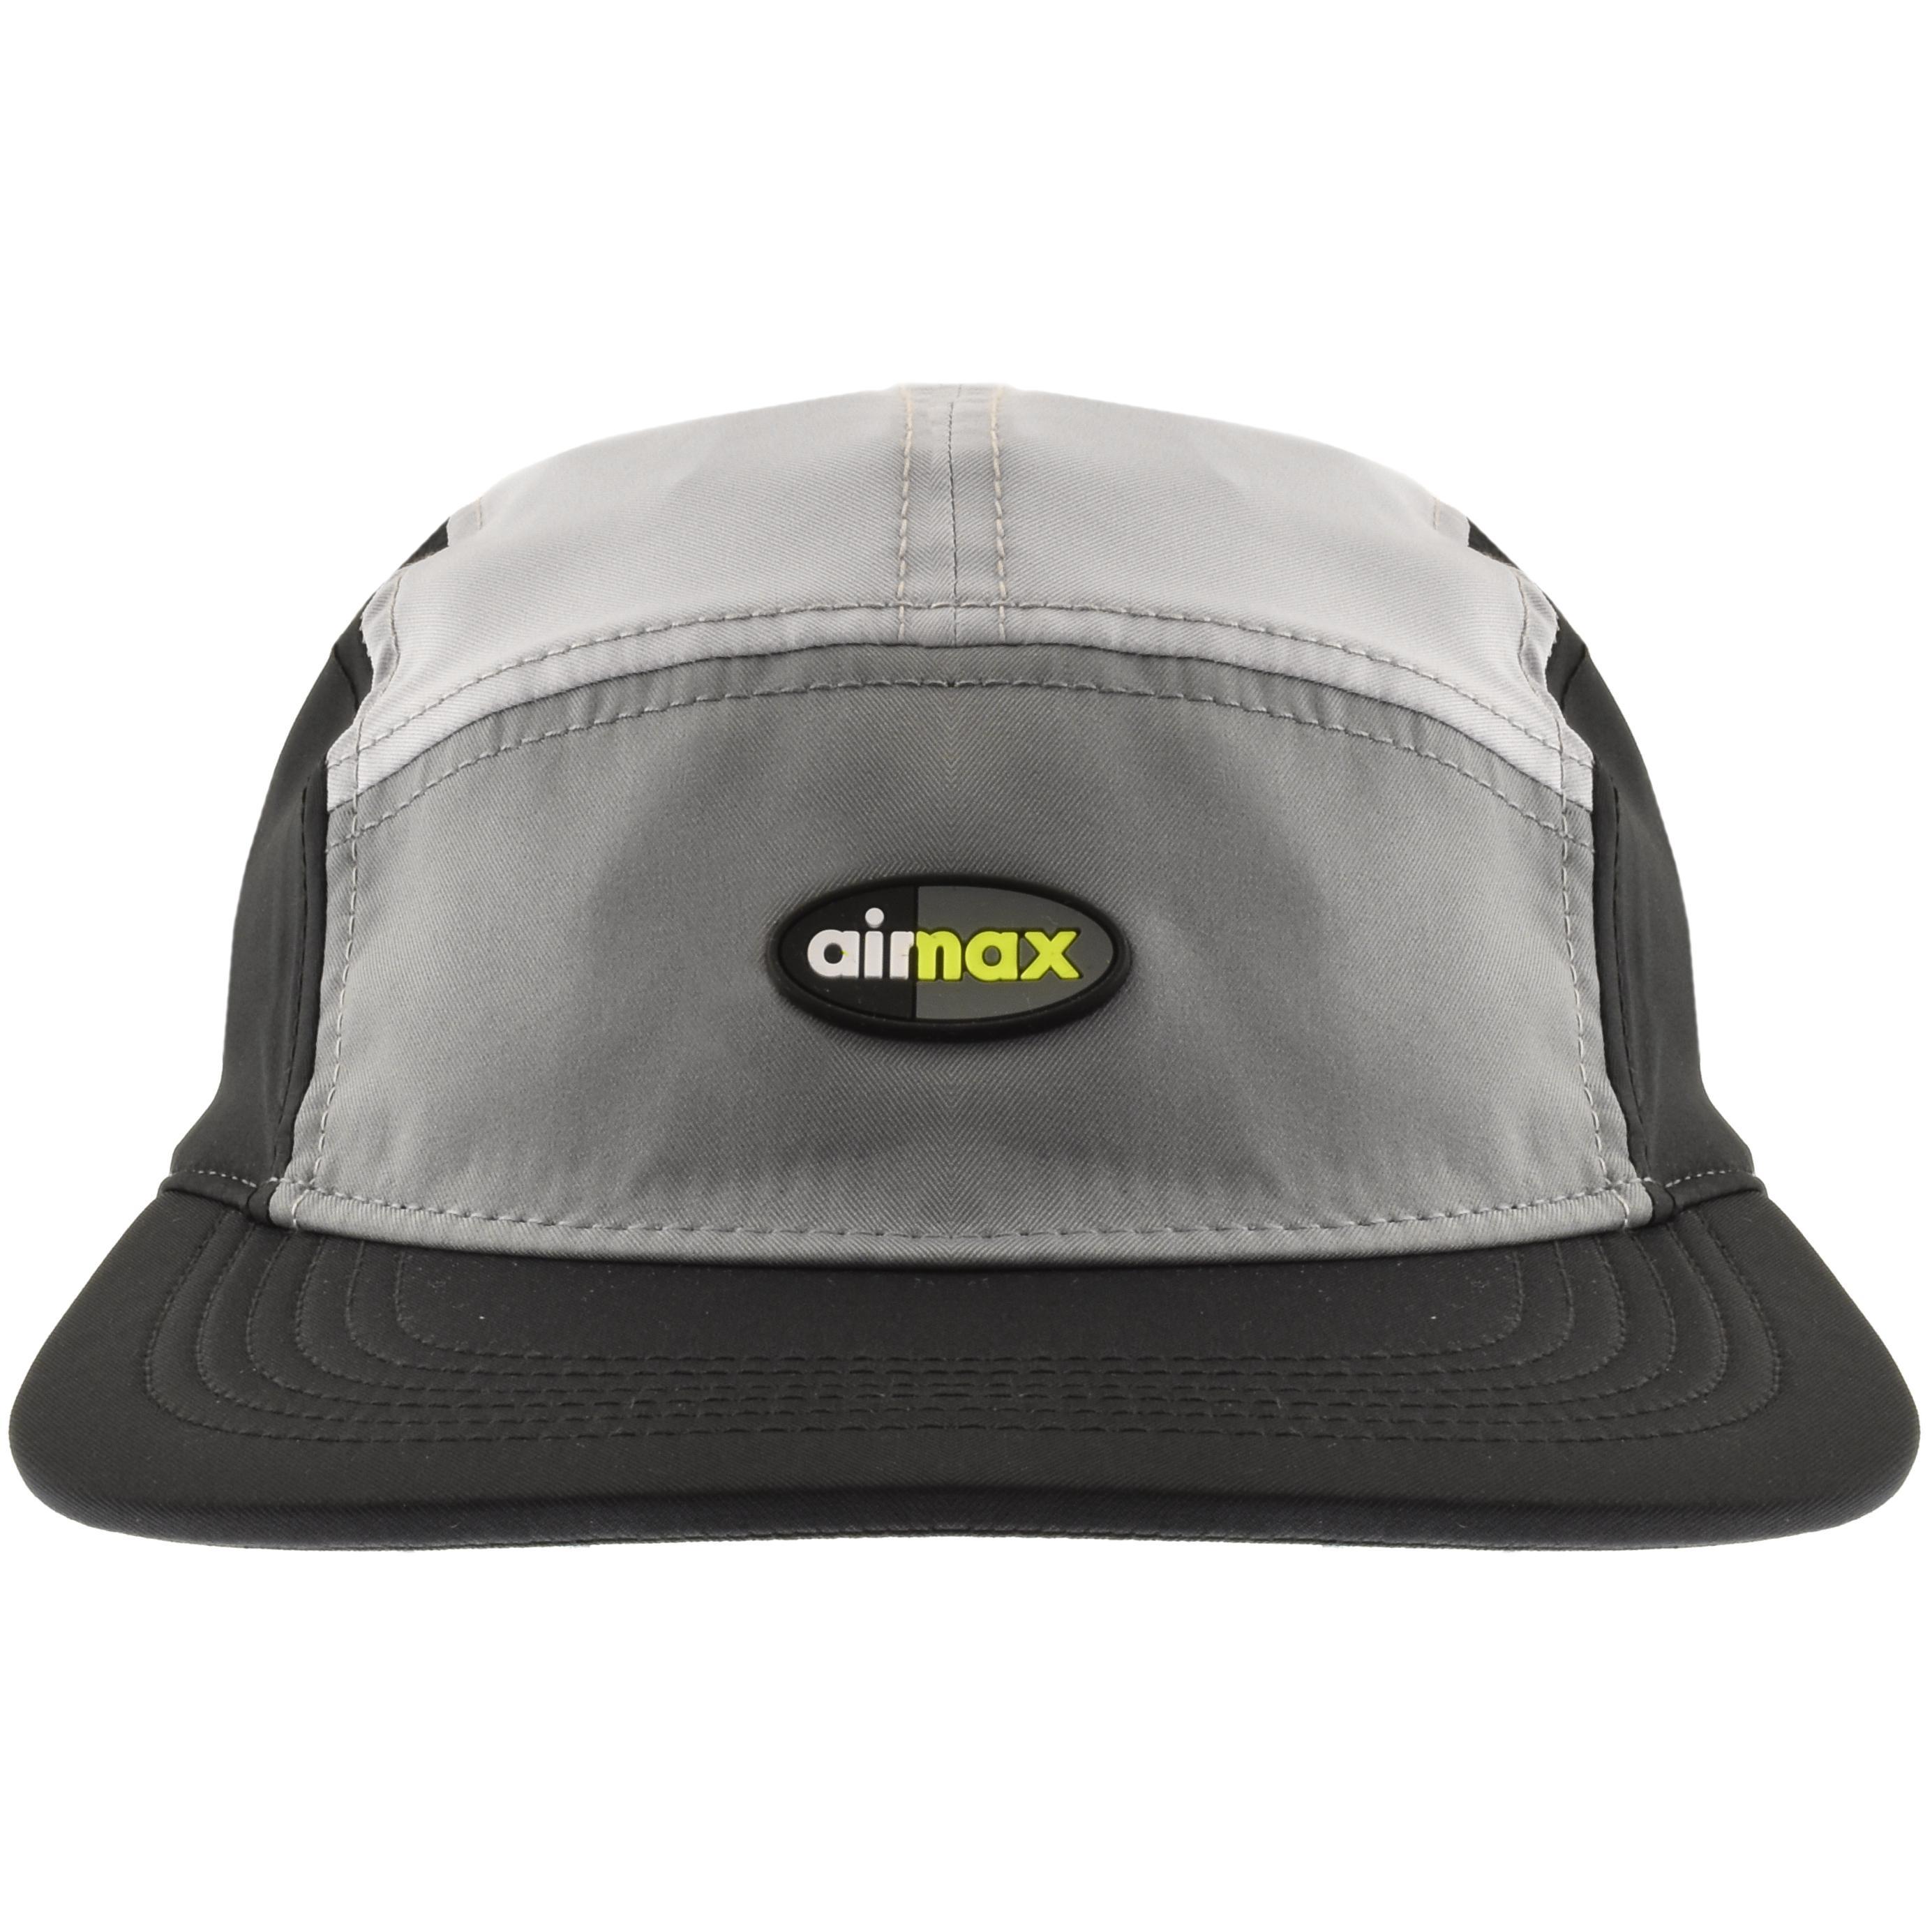 0676dc88 Nike Air Max Aerobill Cap Grey in Gray for Men - Lyst